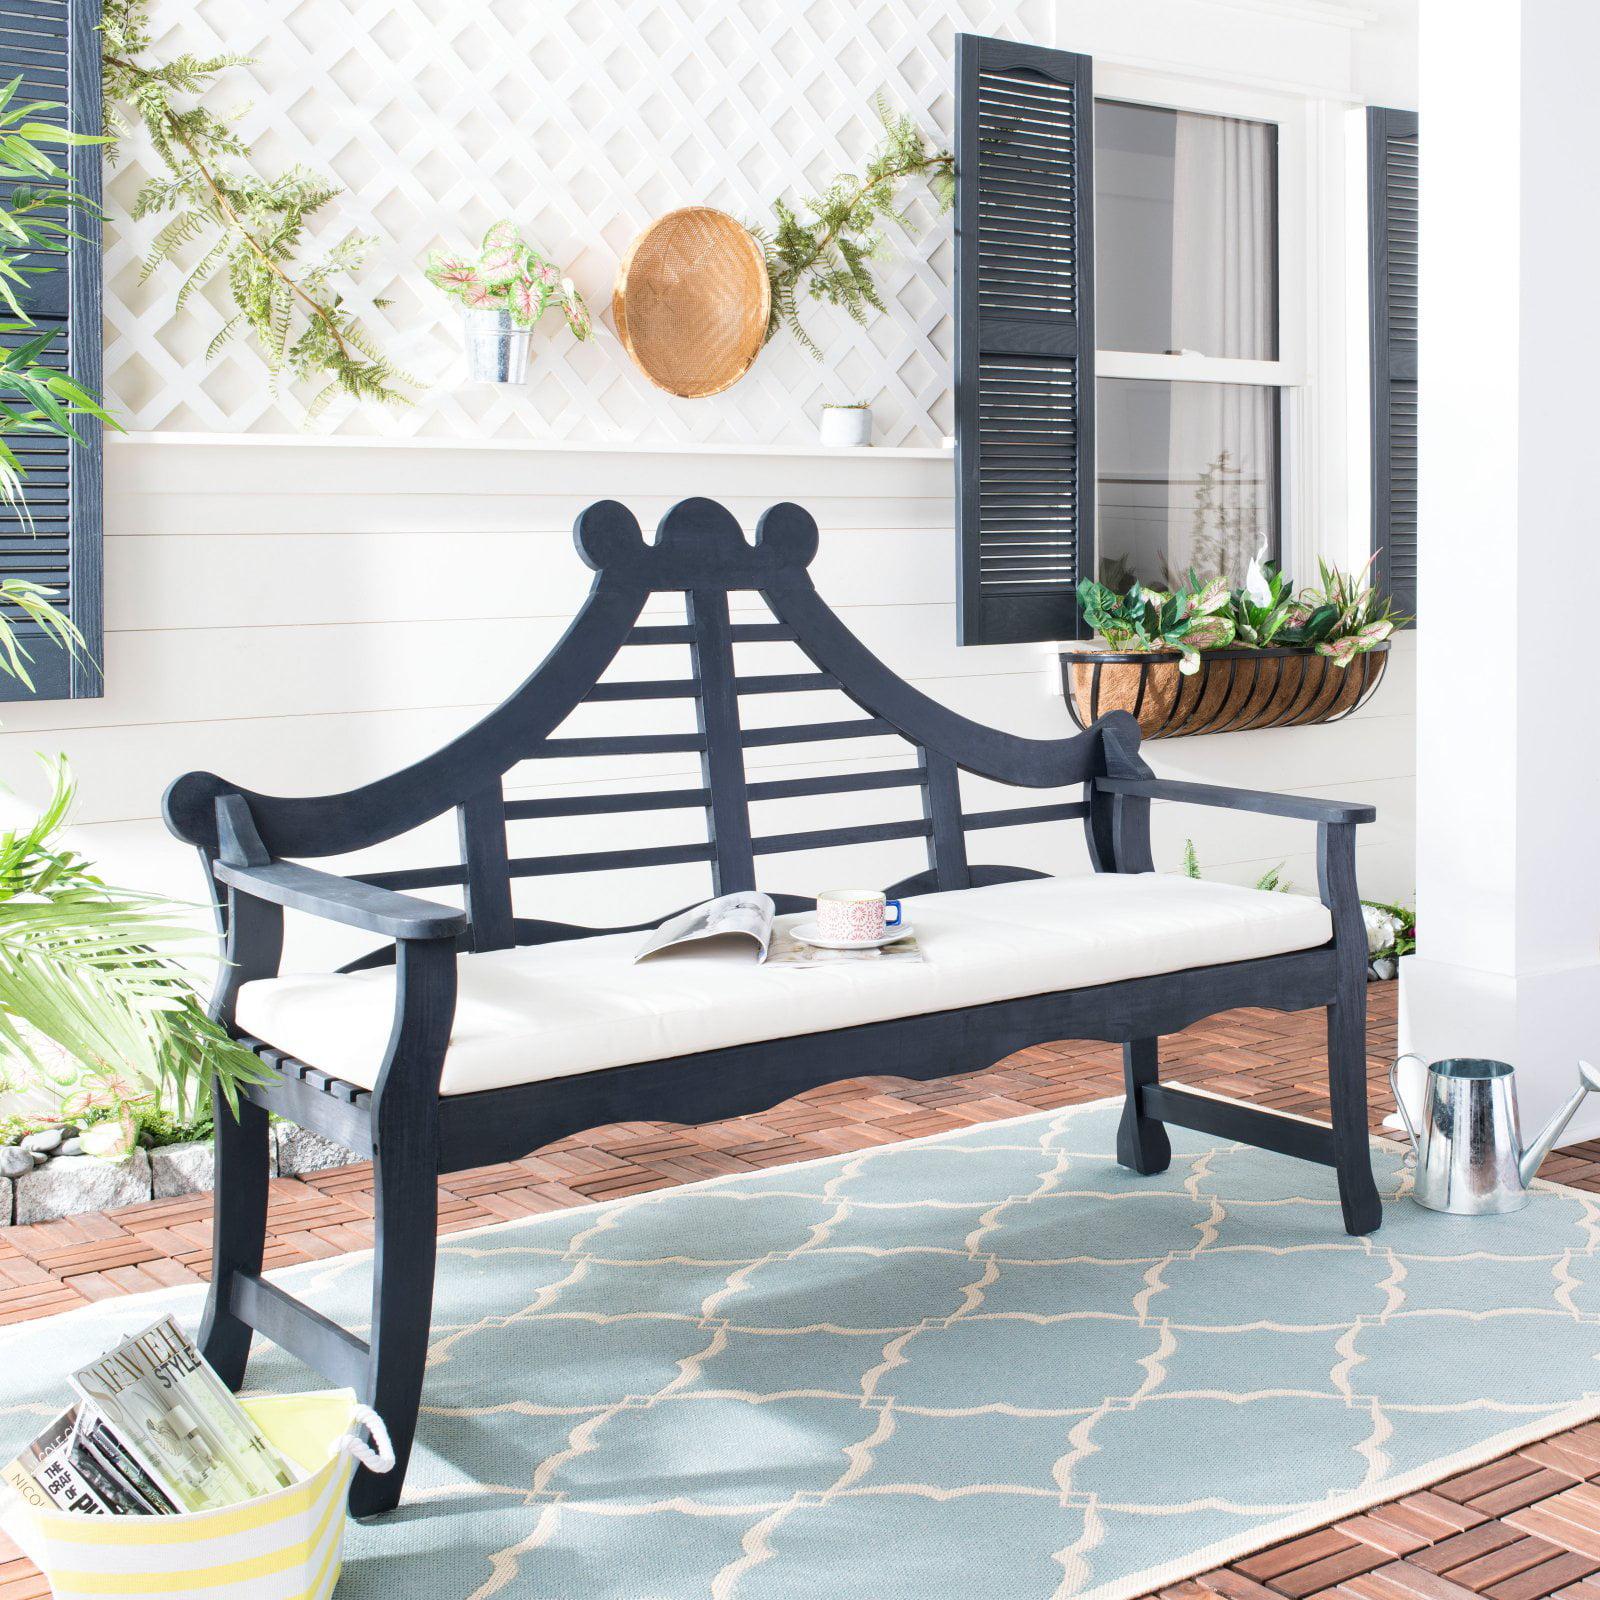 Safavieh Azusa Indoor/Outdoor Traditional Garden Bench with Cushion